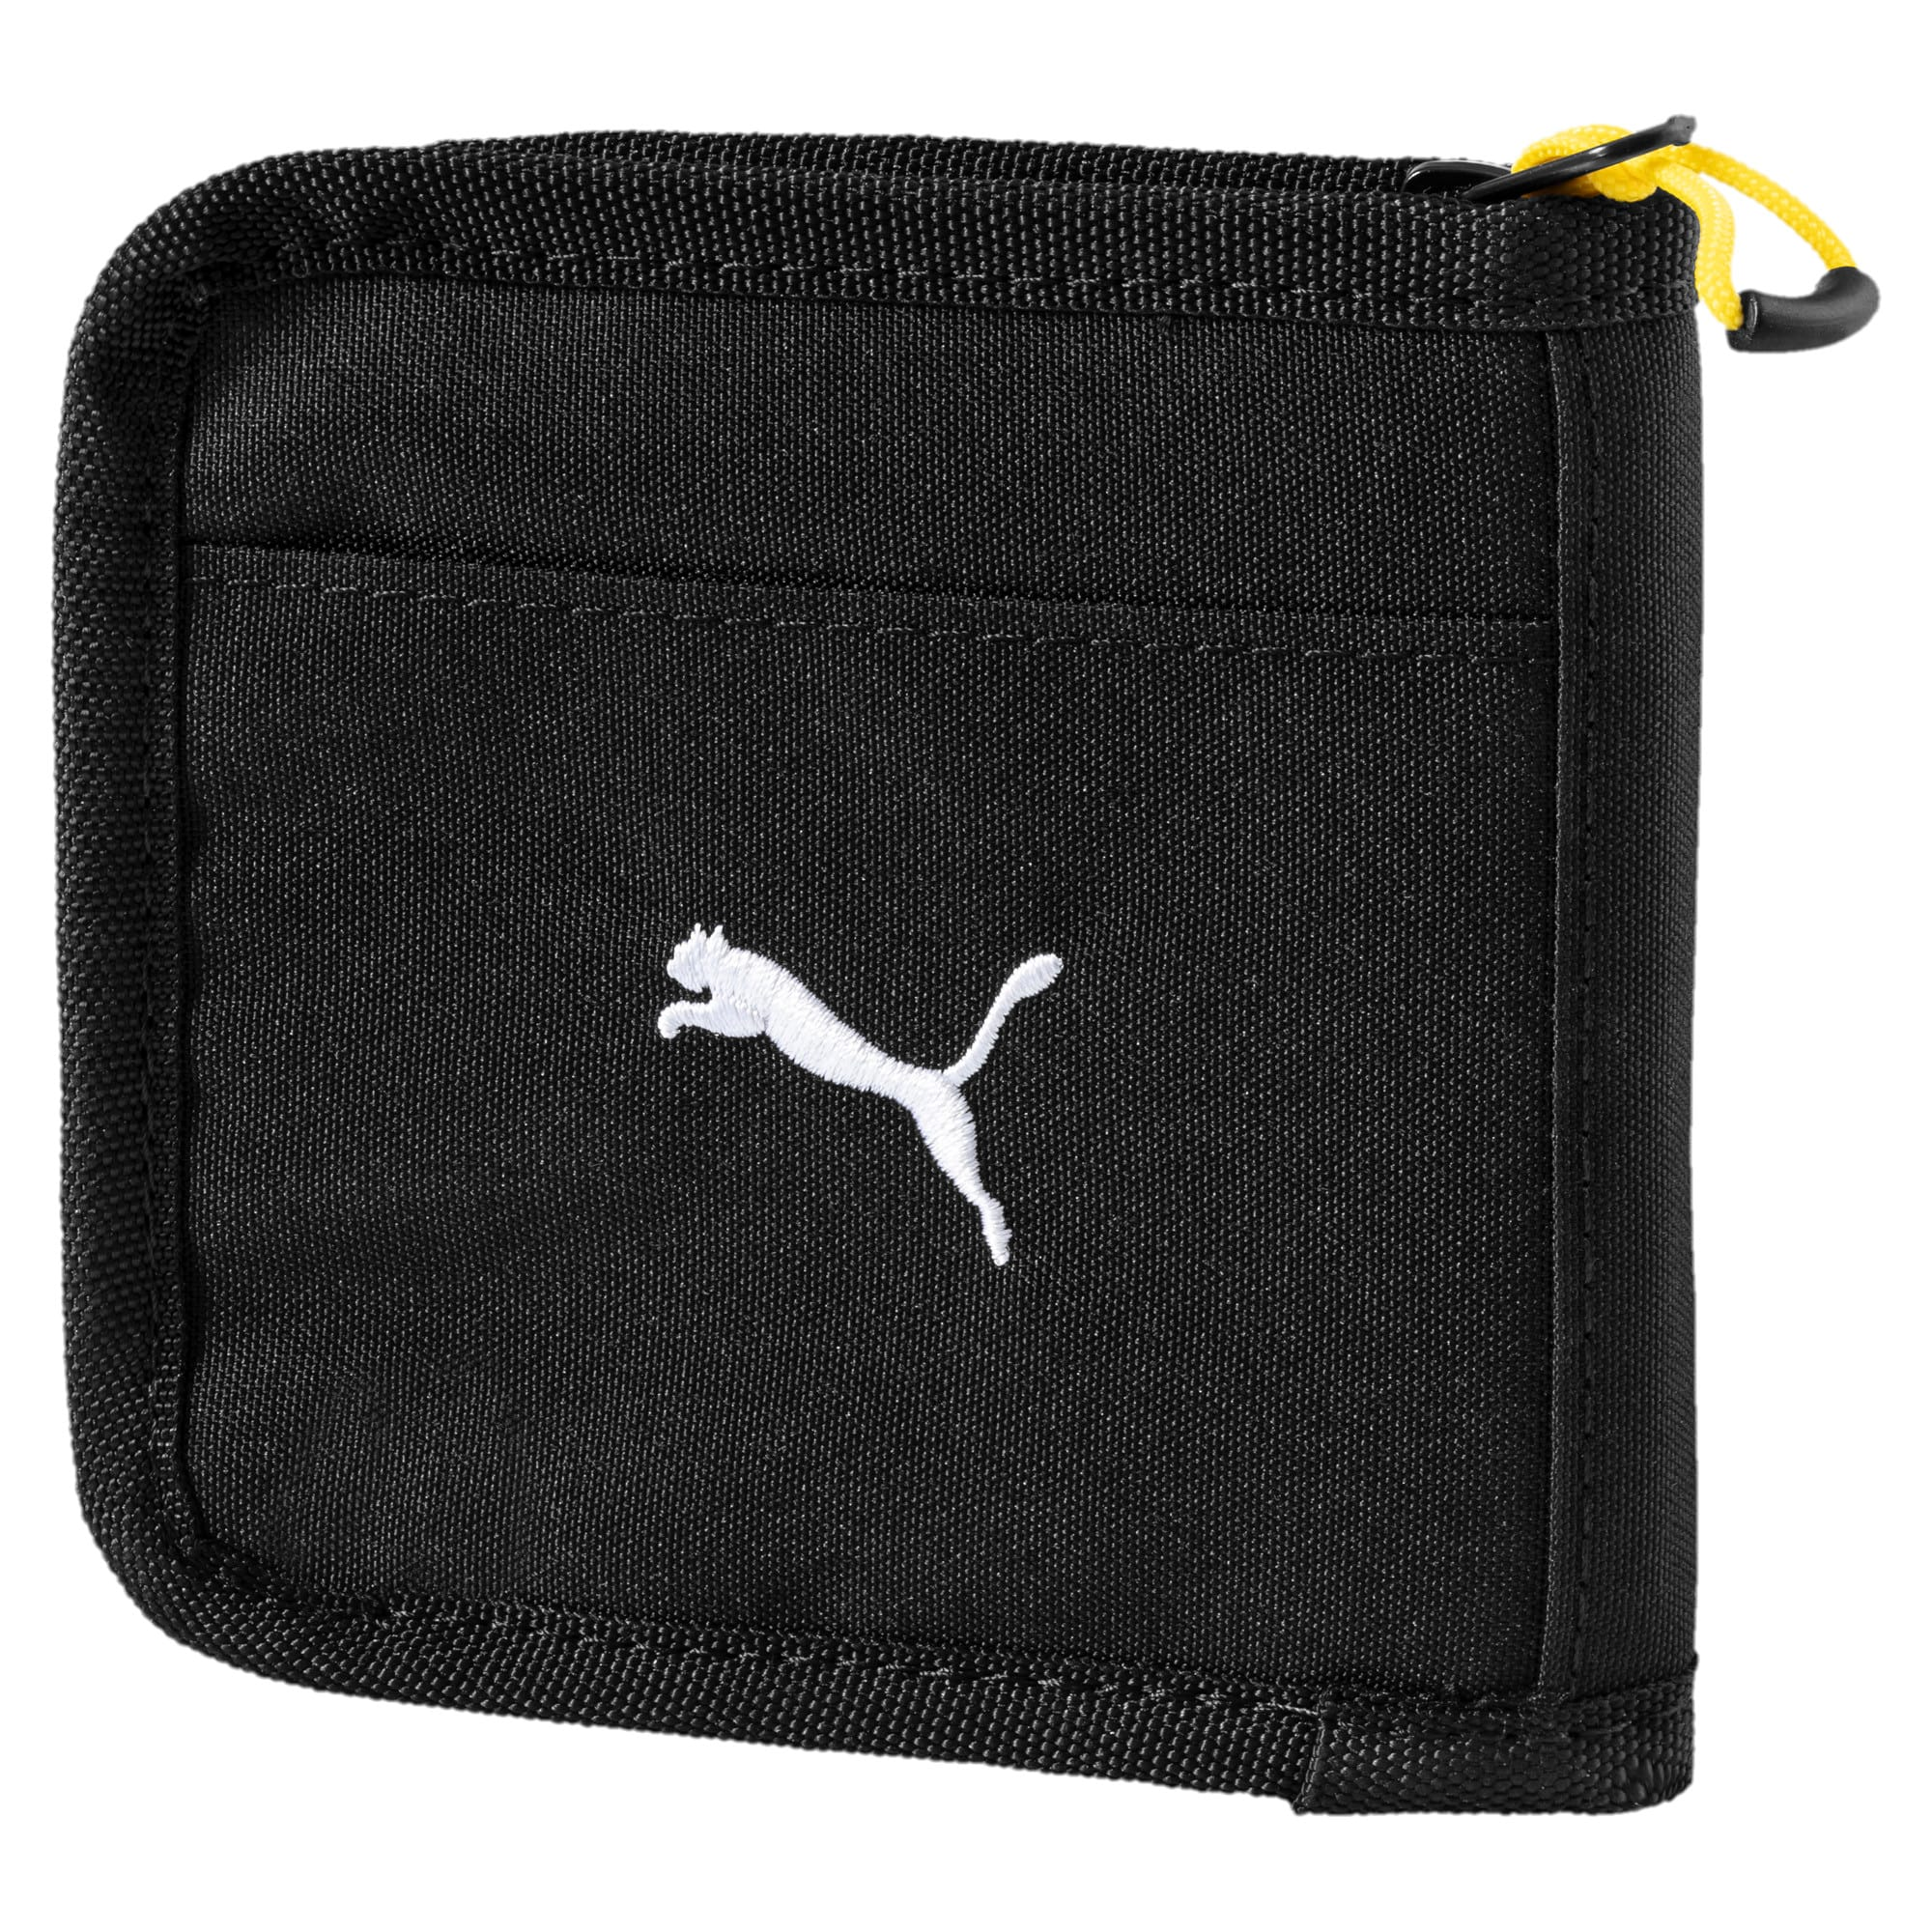 Thumbnail 2 of Ferrari Fanwear Wallet, Puma Black, medium-IND